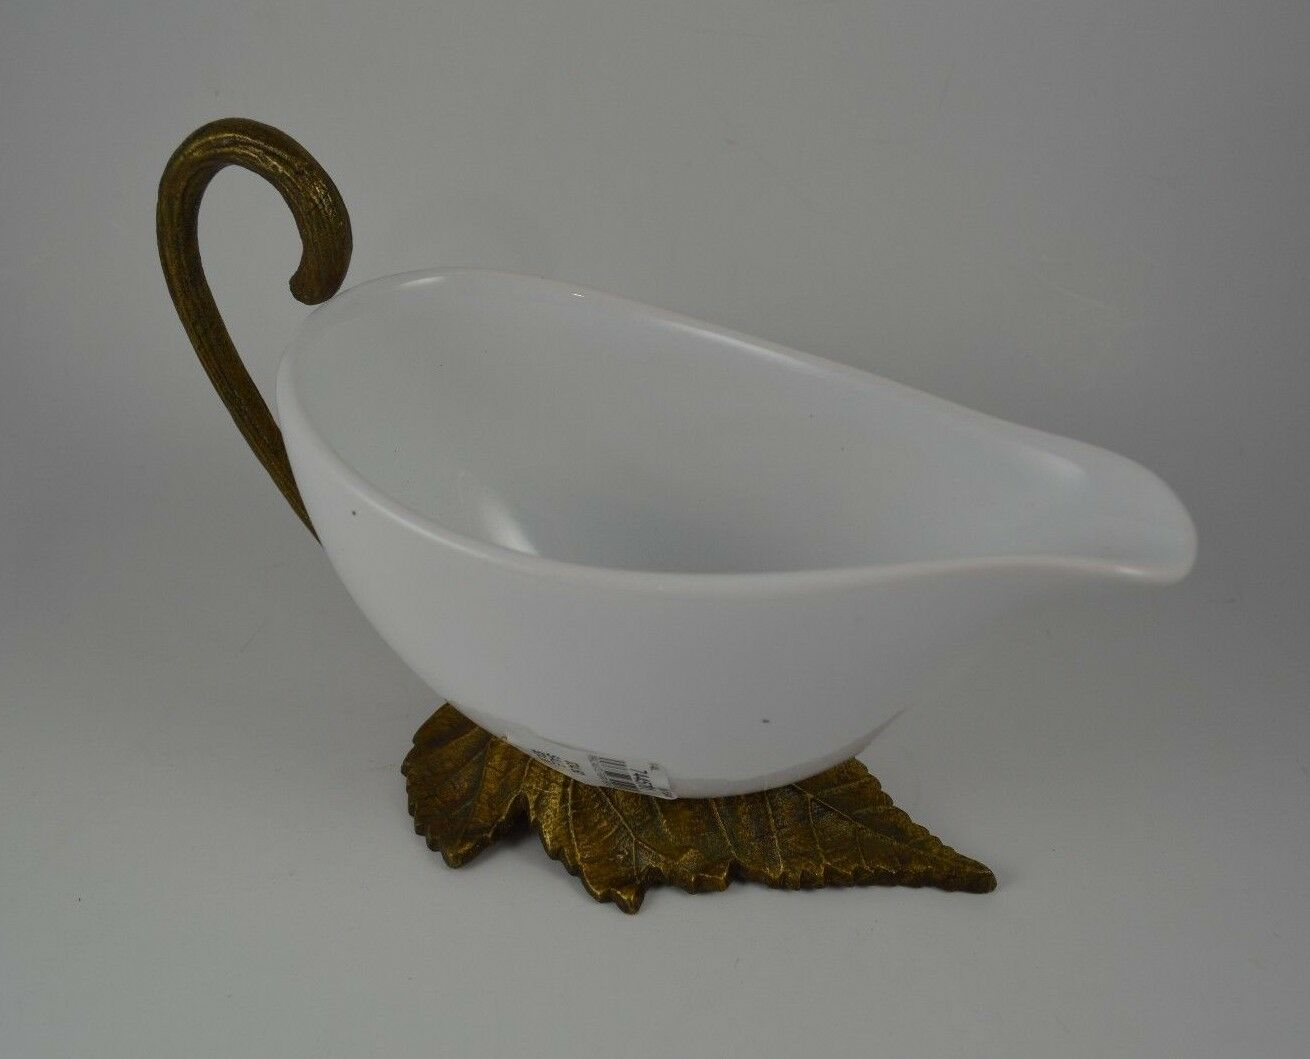 Pottery Barn Cast Leaf Gravy Boat Bowl White Ceramic & gold Leaf